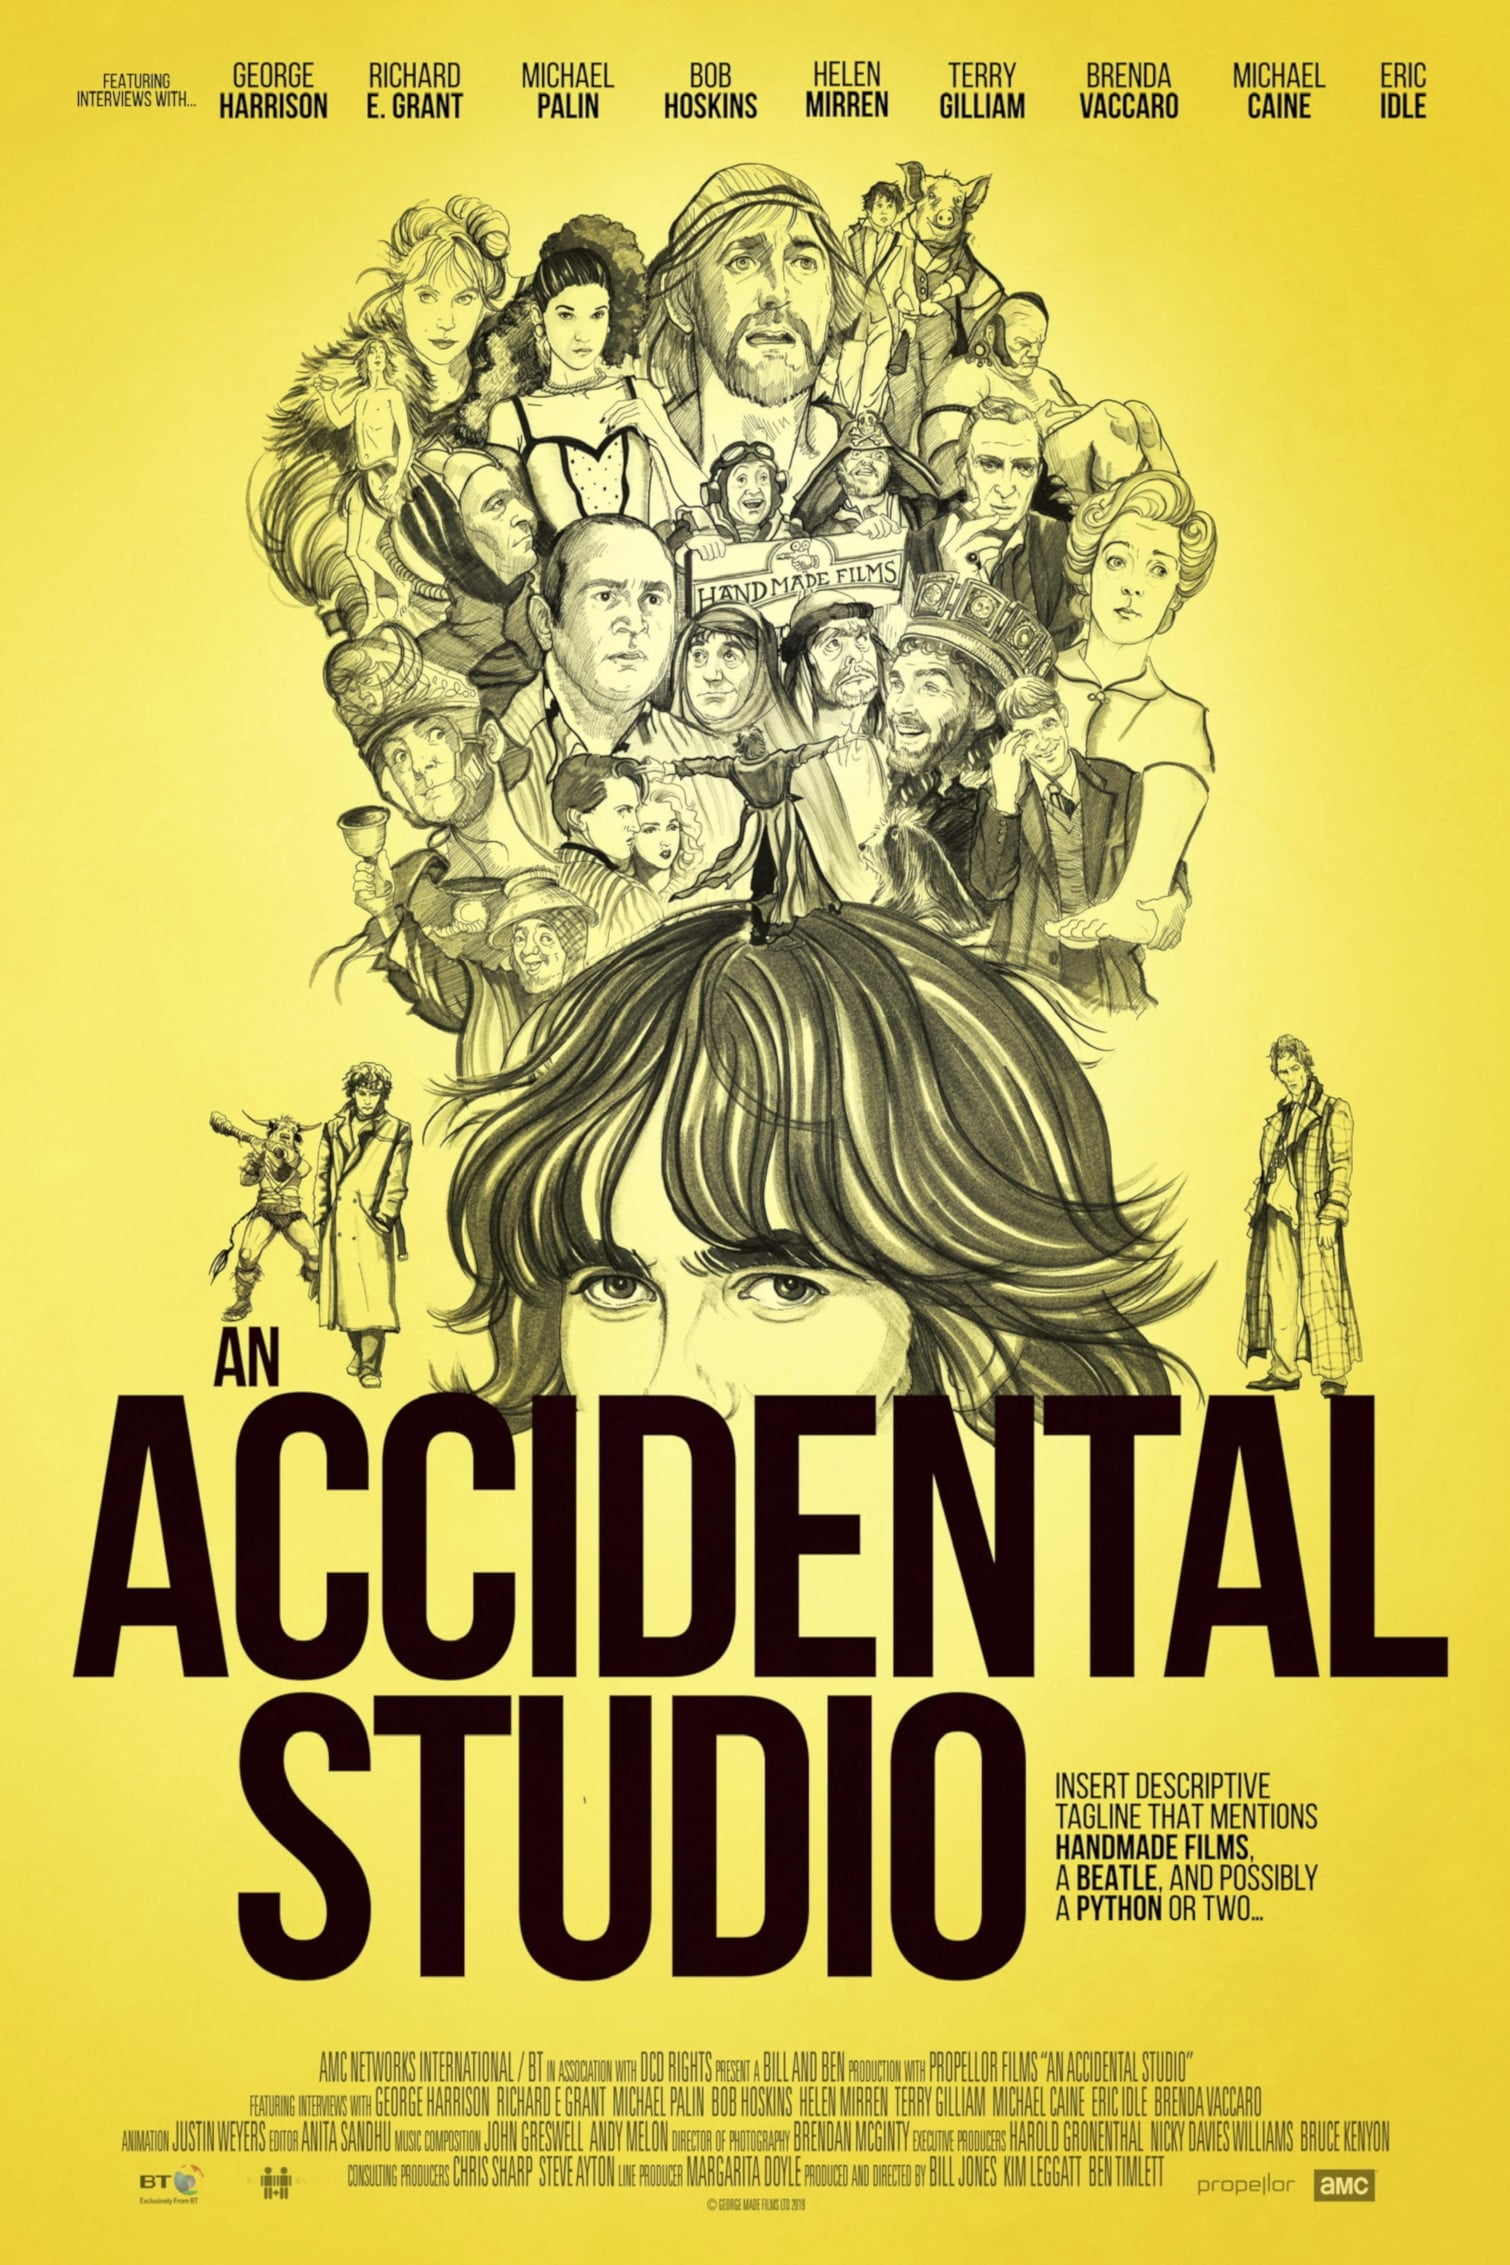 An Accidental Studio Trailer